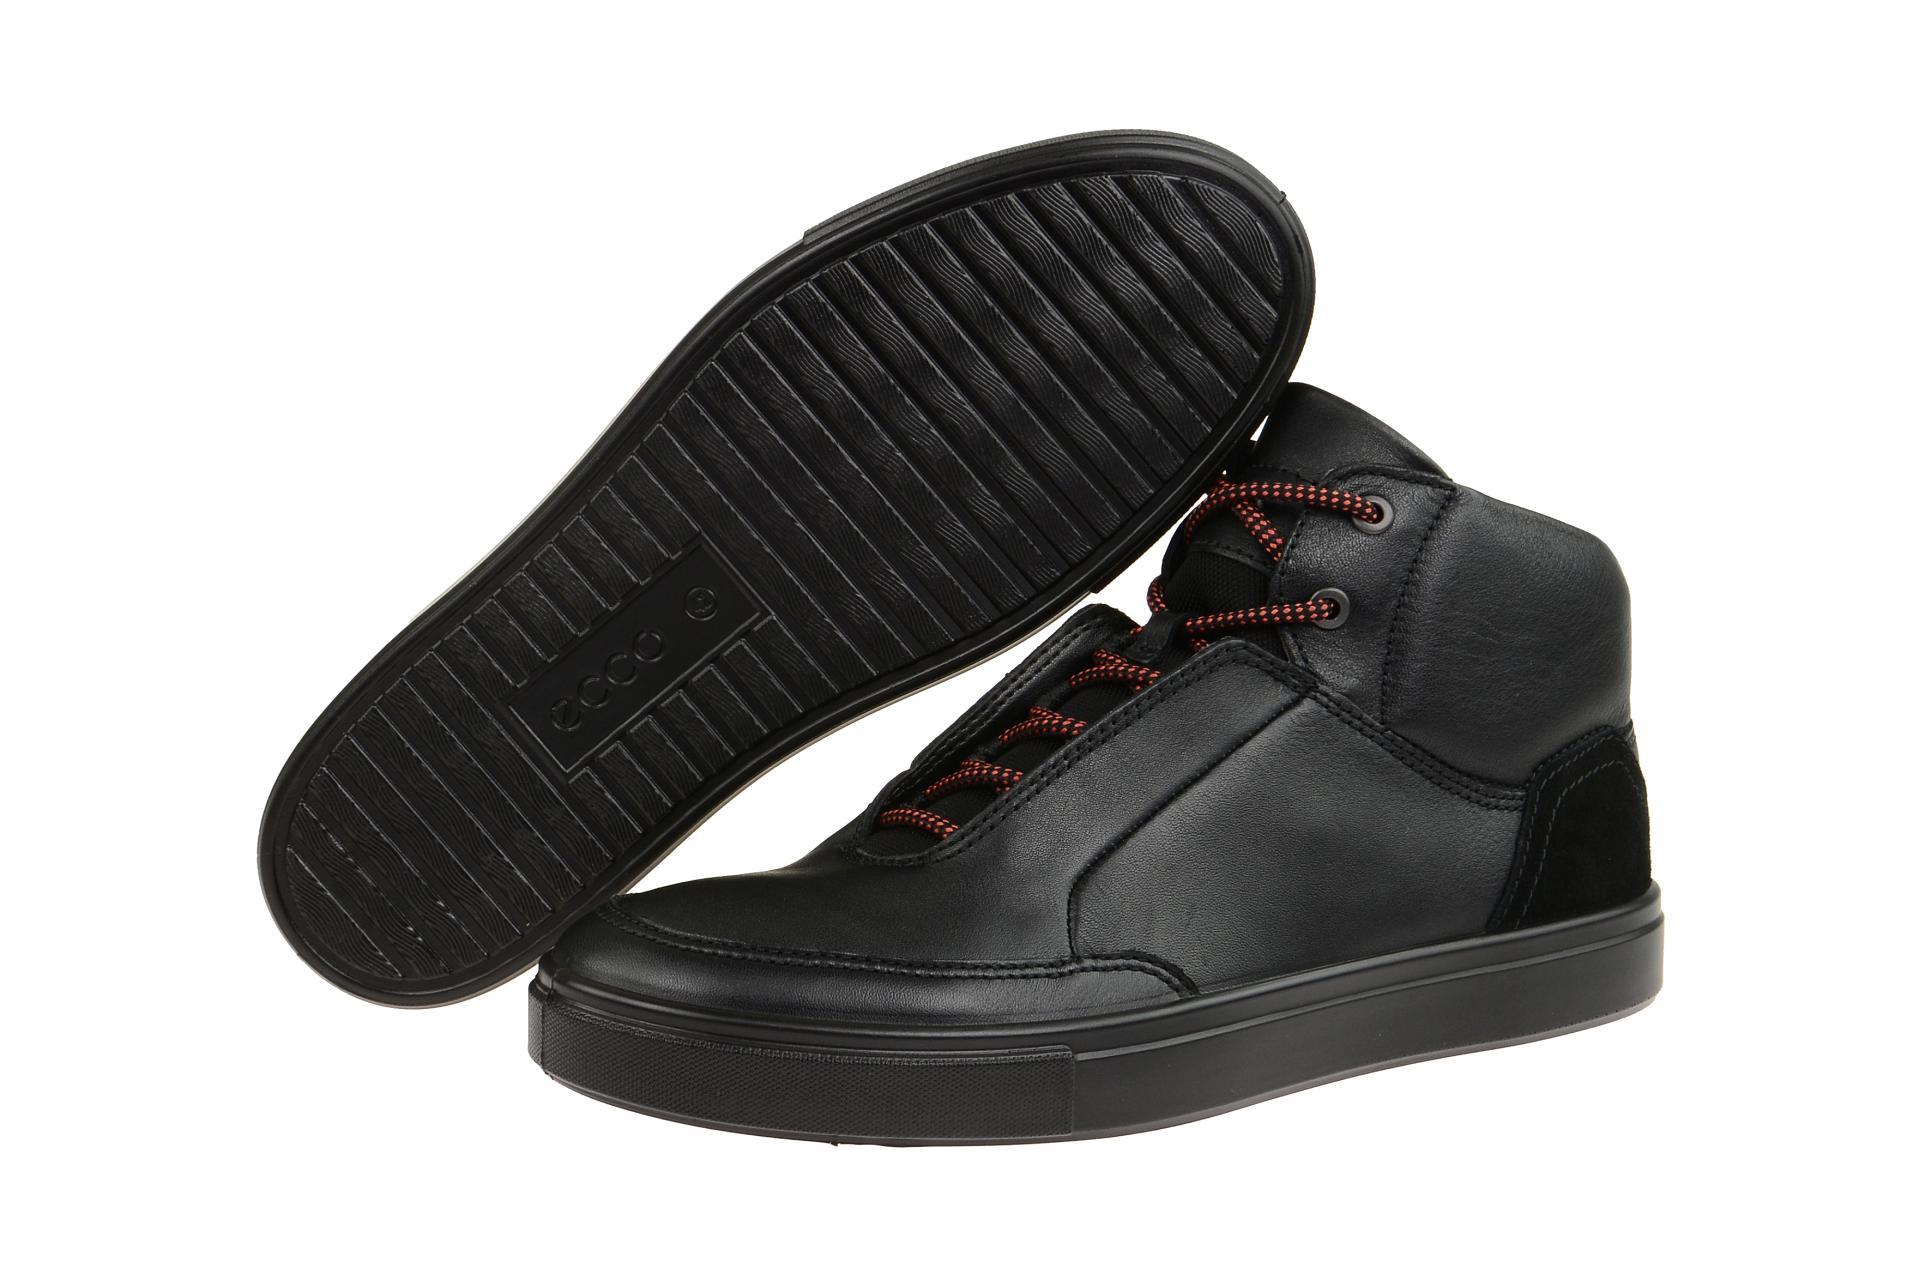 56cfa93ef56b4d Ecco Schuhe KYLE schwarz Herrenschuhe Mid cut Sneaker 53066451052 ...